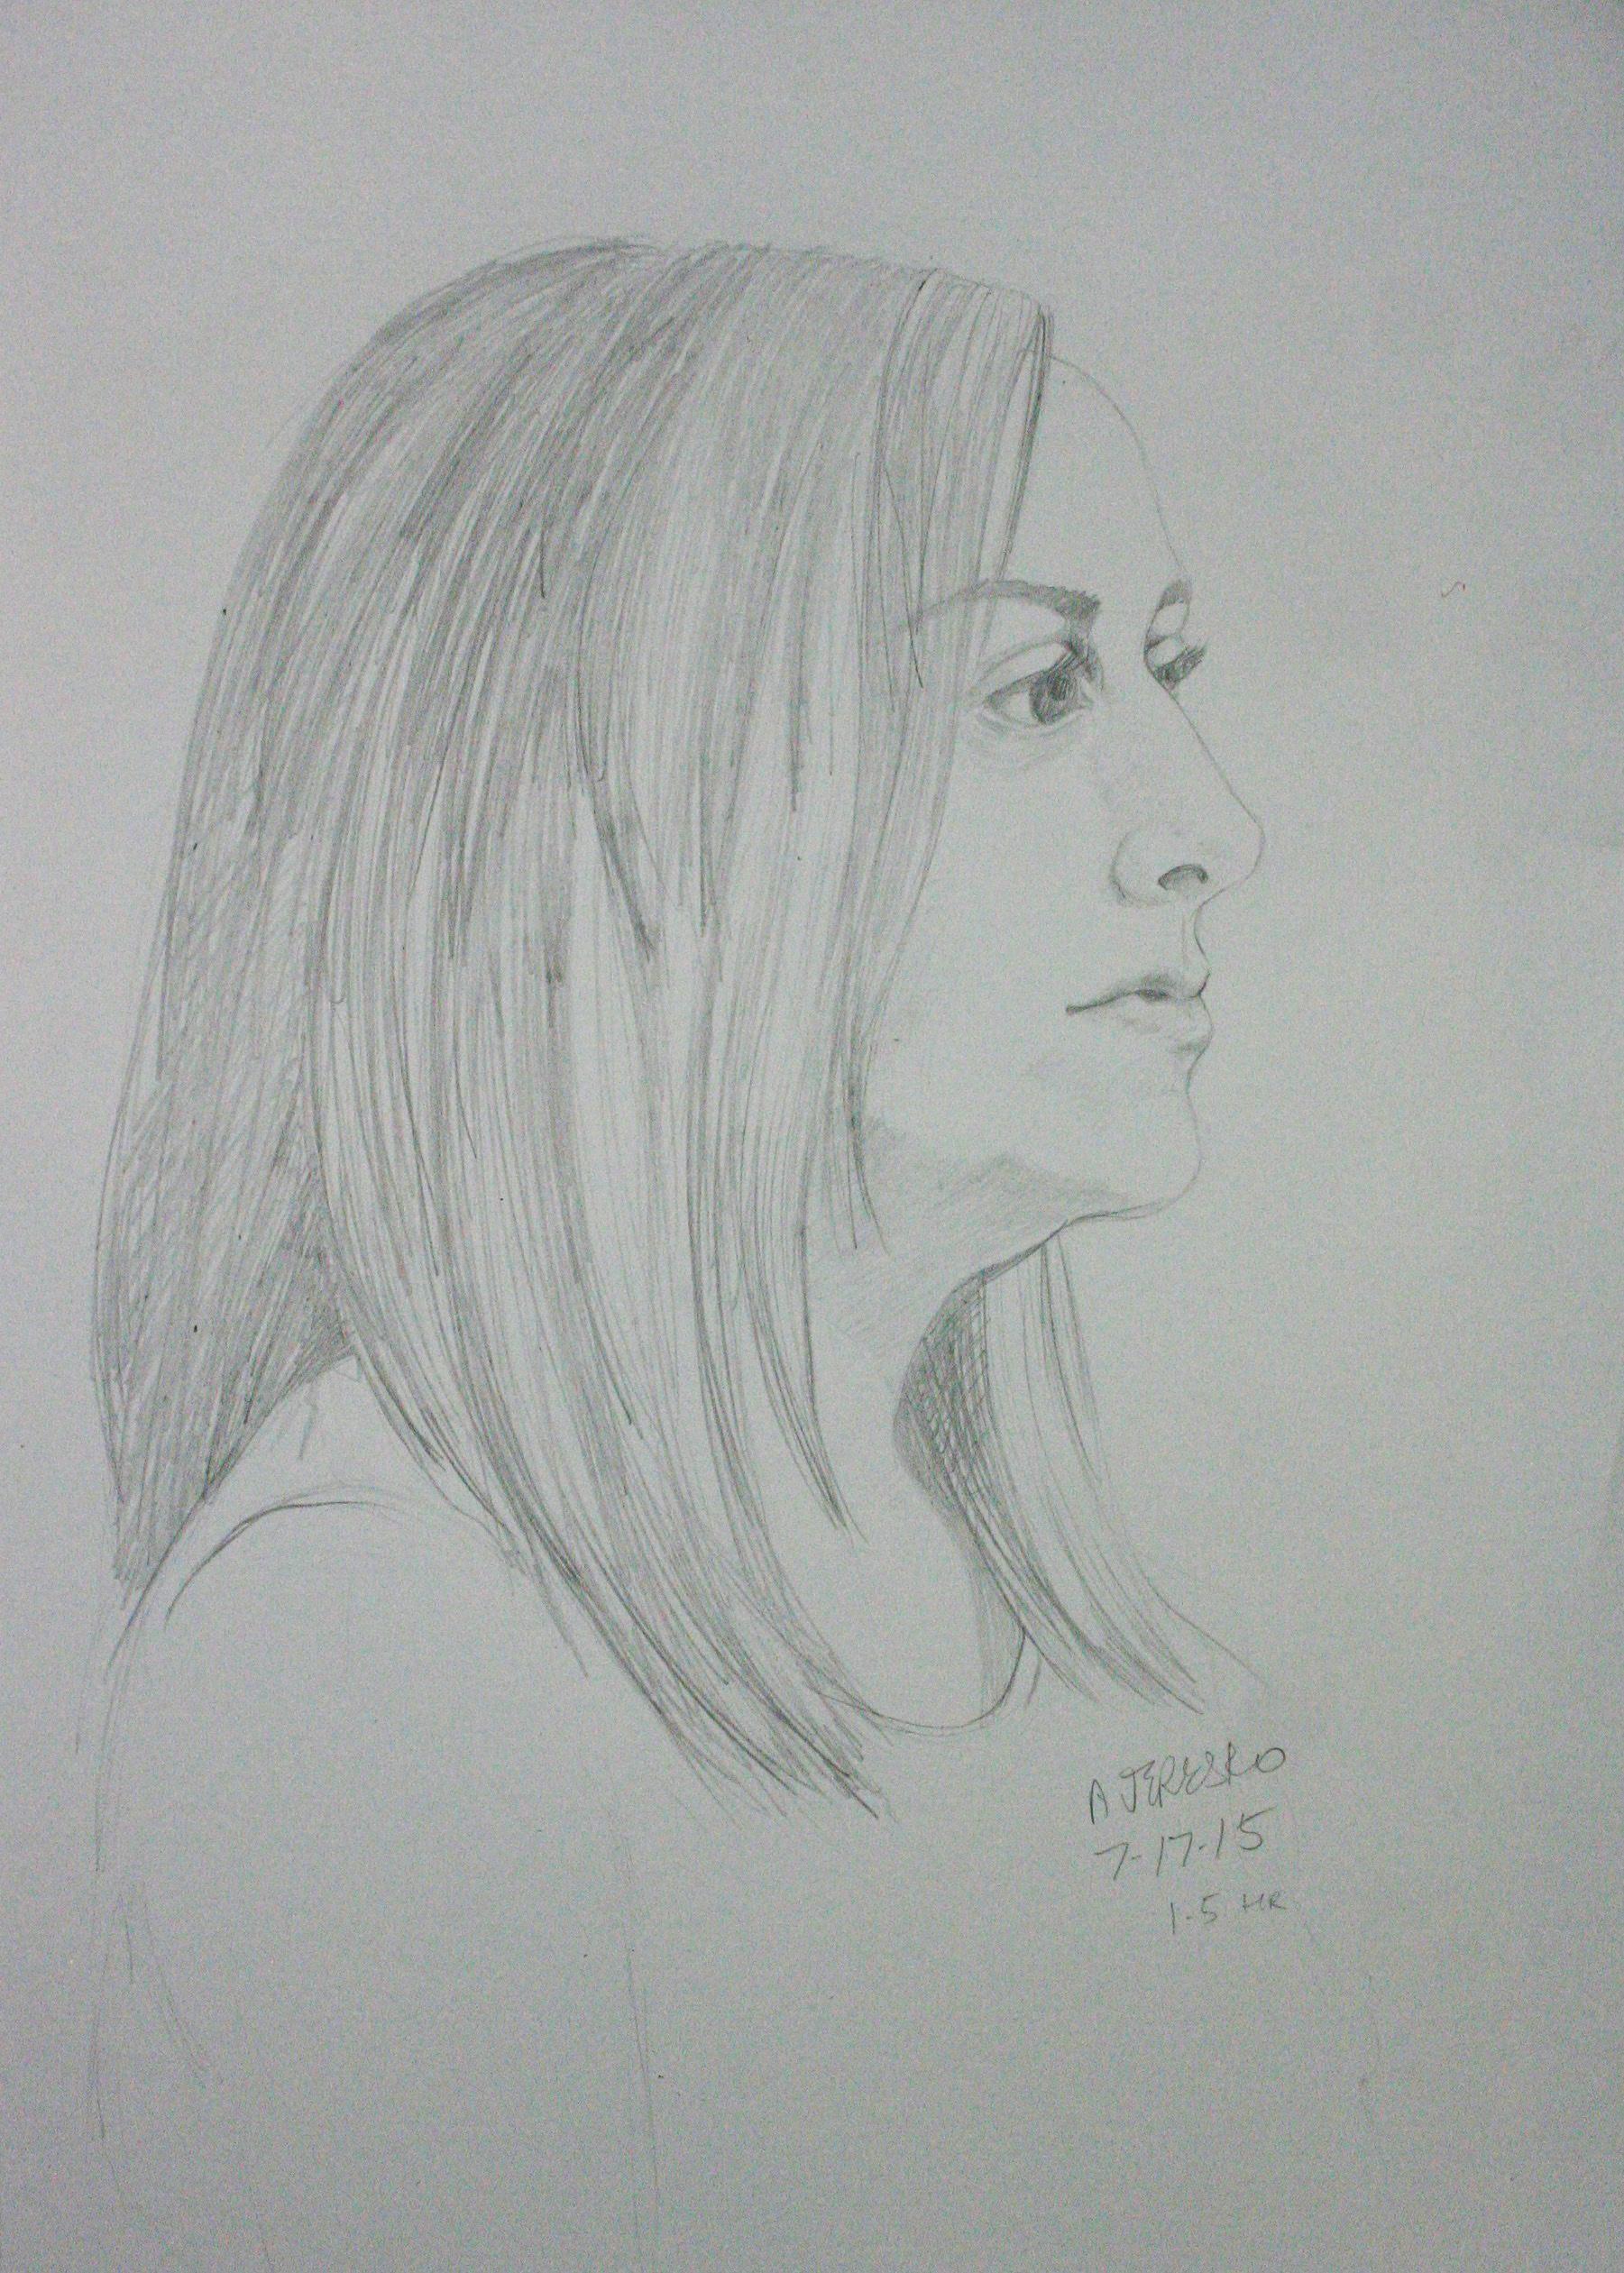 Alice Jeresko did this hour drawing.